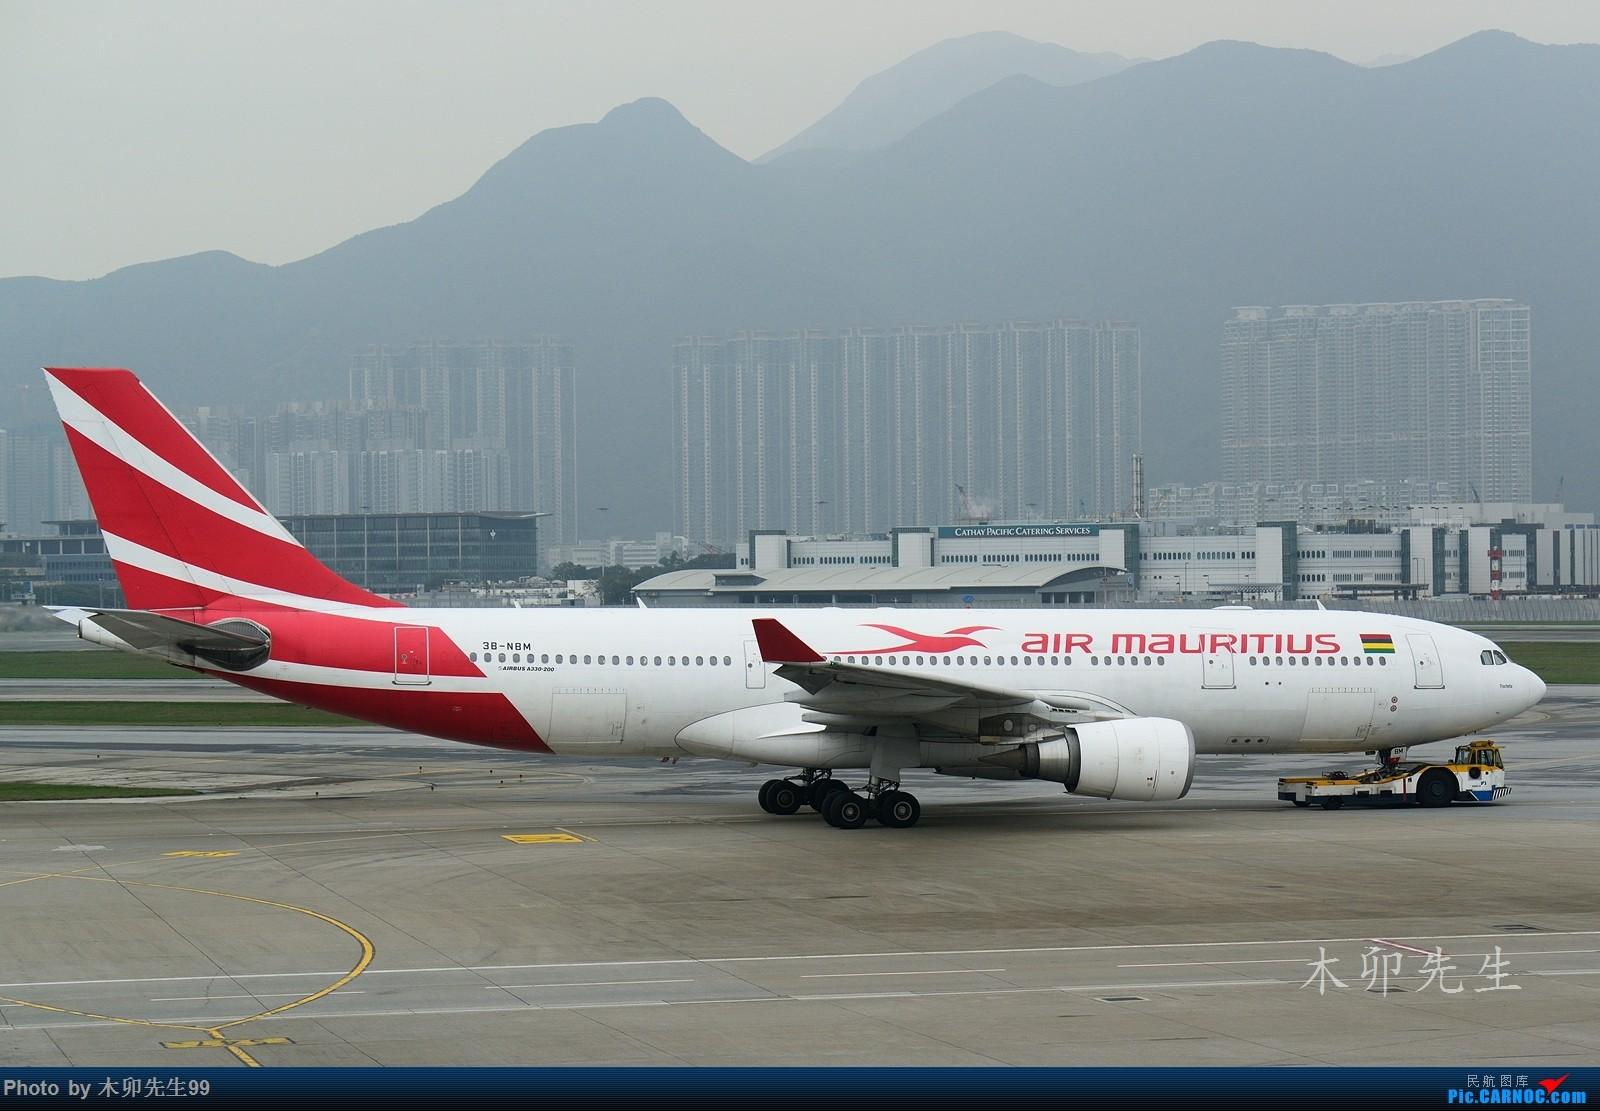 Re:【木卯先生99】——001香港拍机——陆续发一些我的第一次拍摄到的新飞机,供大家欣赏,欢迎您常来看看(陆续添加) AIRBUS A330-200 3B-NBM 香港国际机场